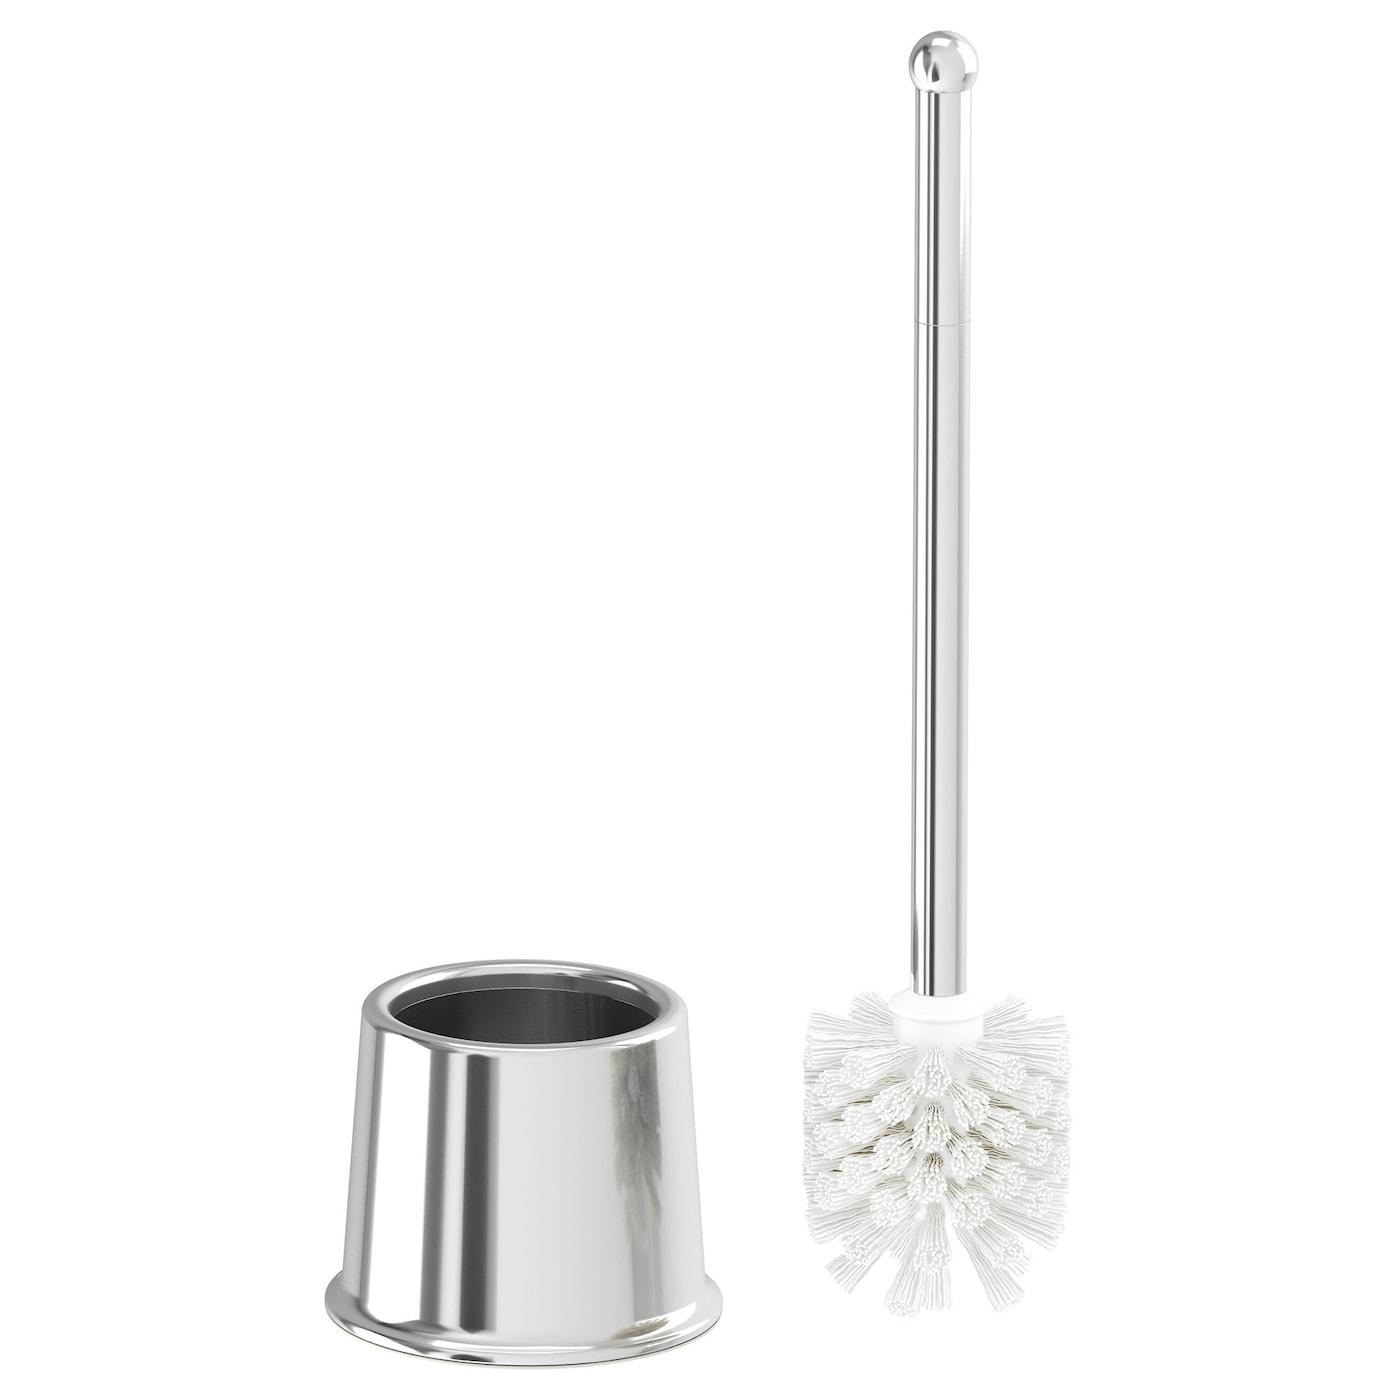 voxnan brosse pour wc effet chrome ikea. Black Bedroom Furniture Sets. Home Design Ideas